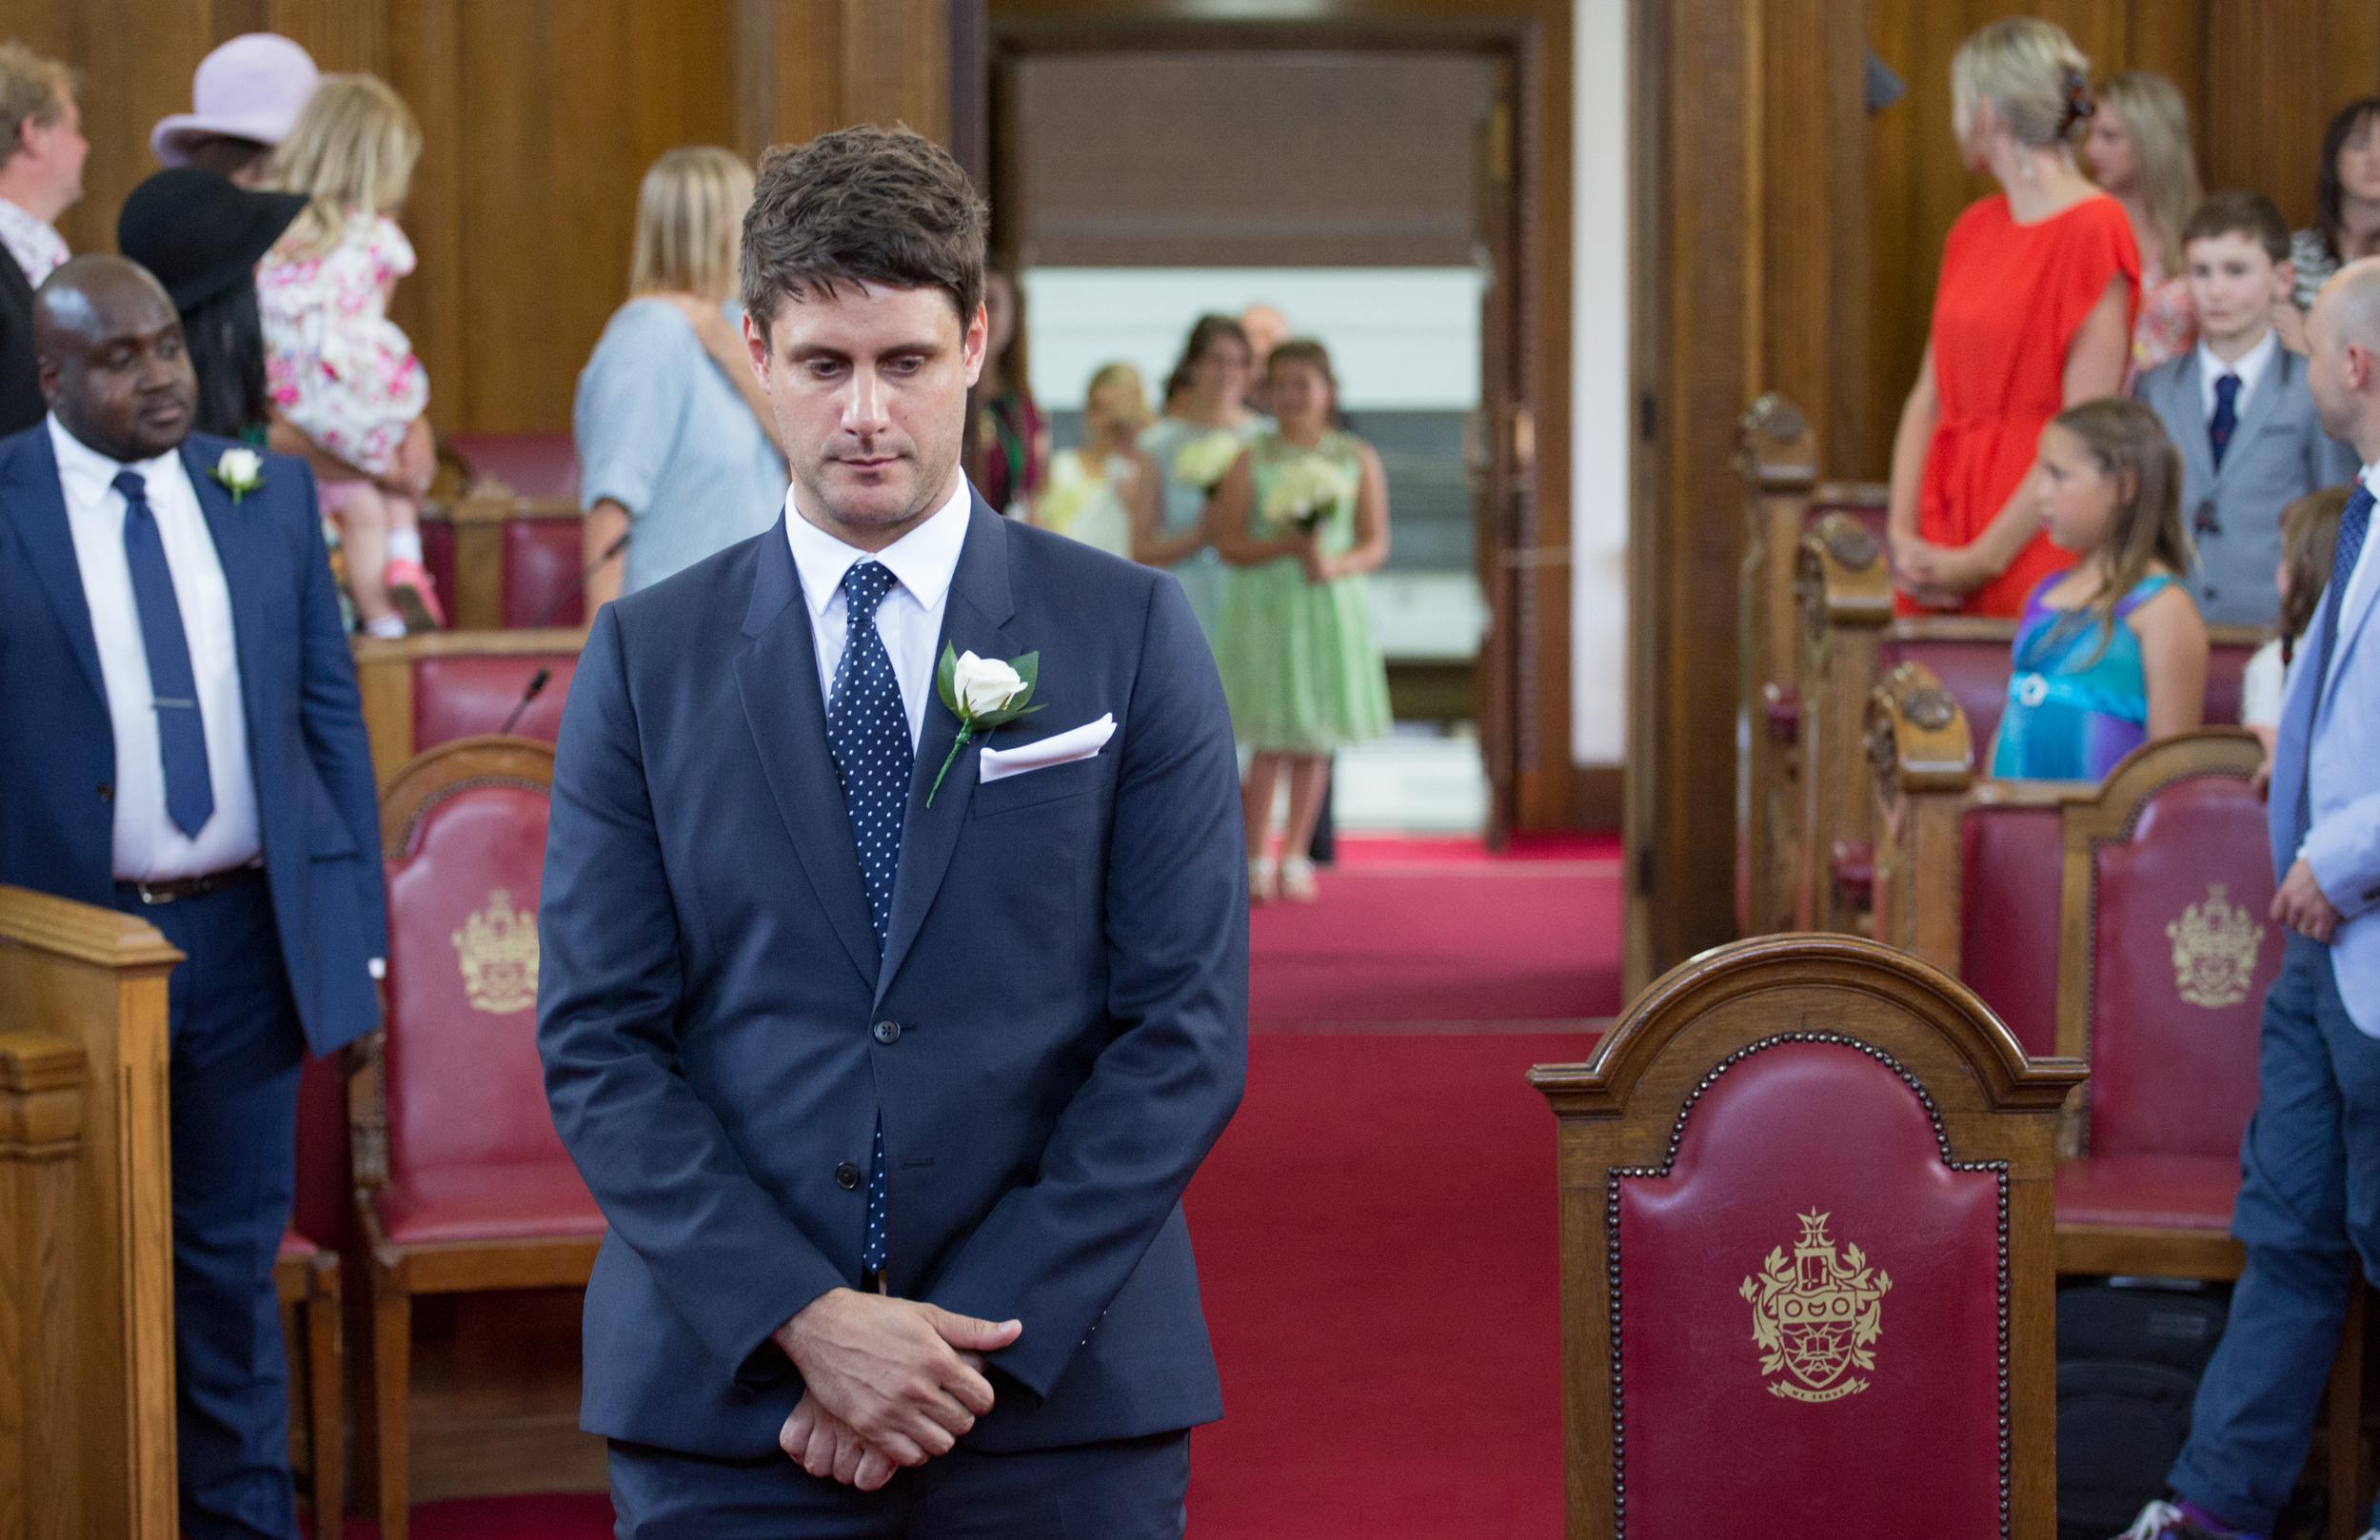 islington-town-hall-london-nervous-groom